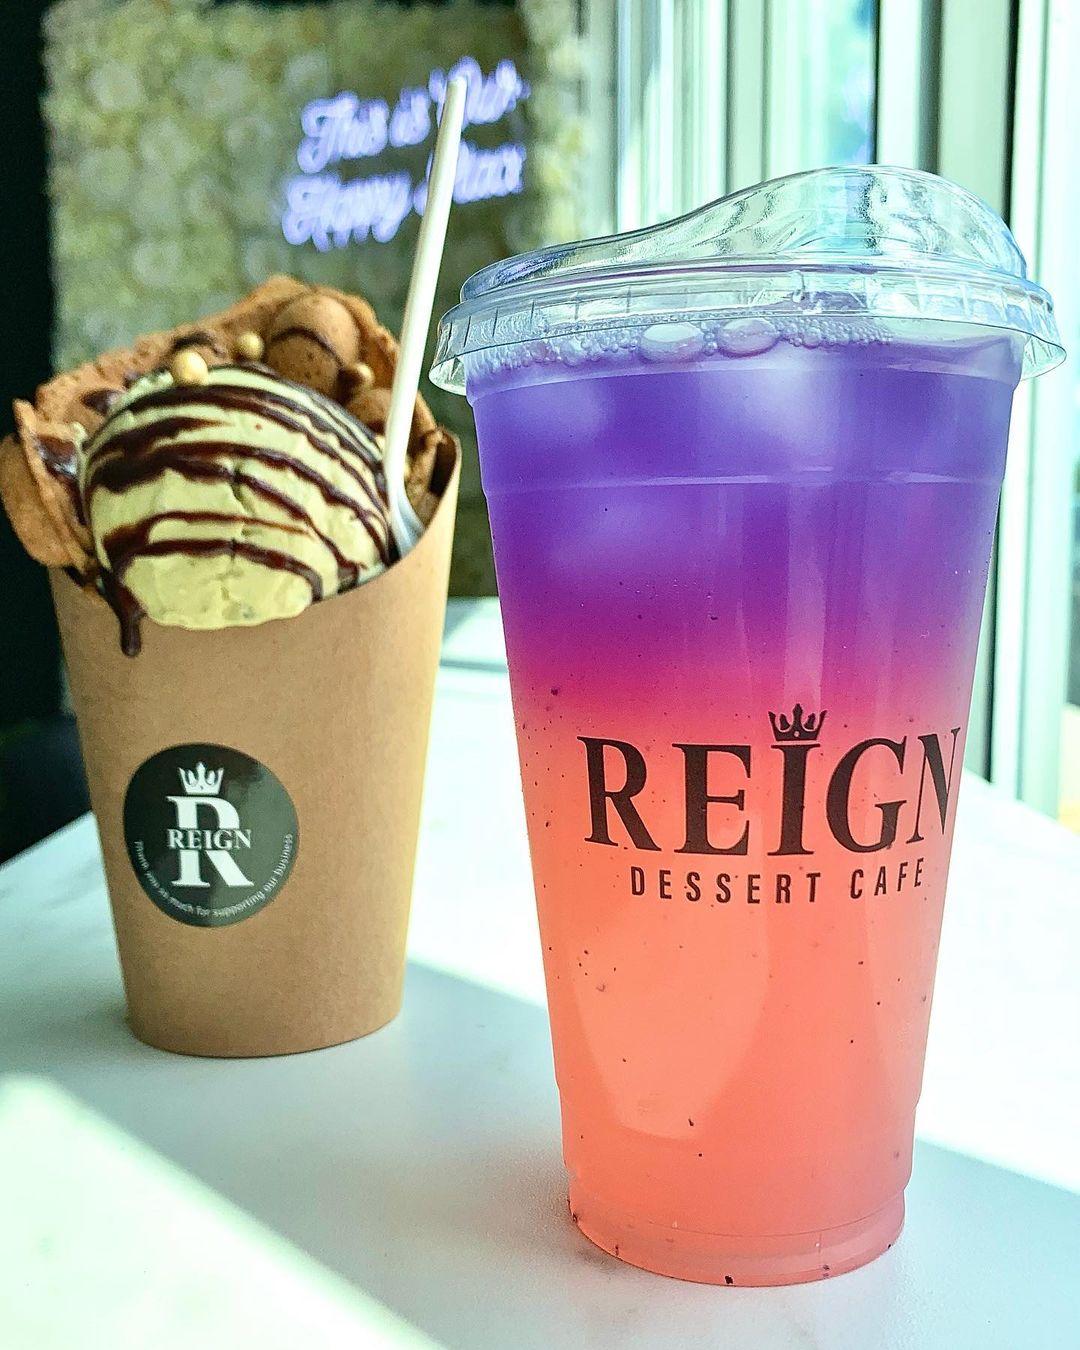 Reign Dessert Cafe